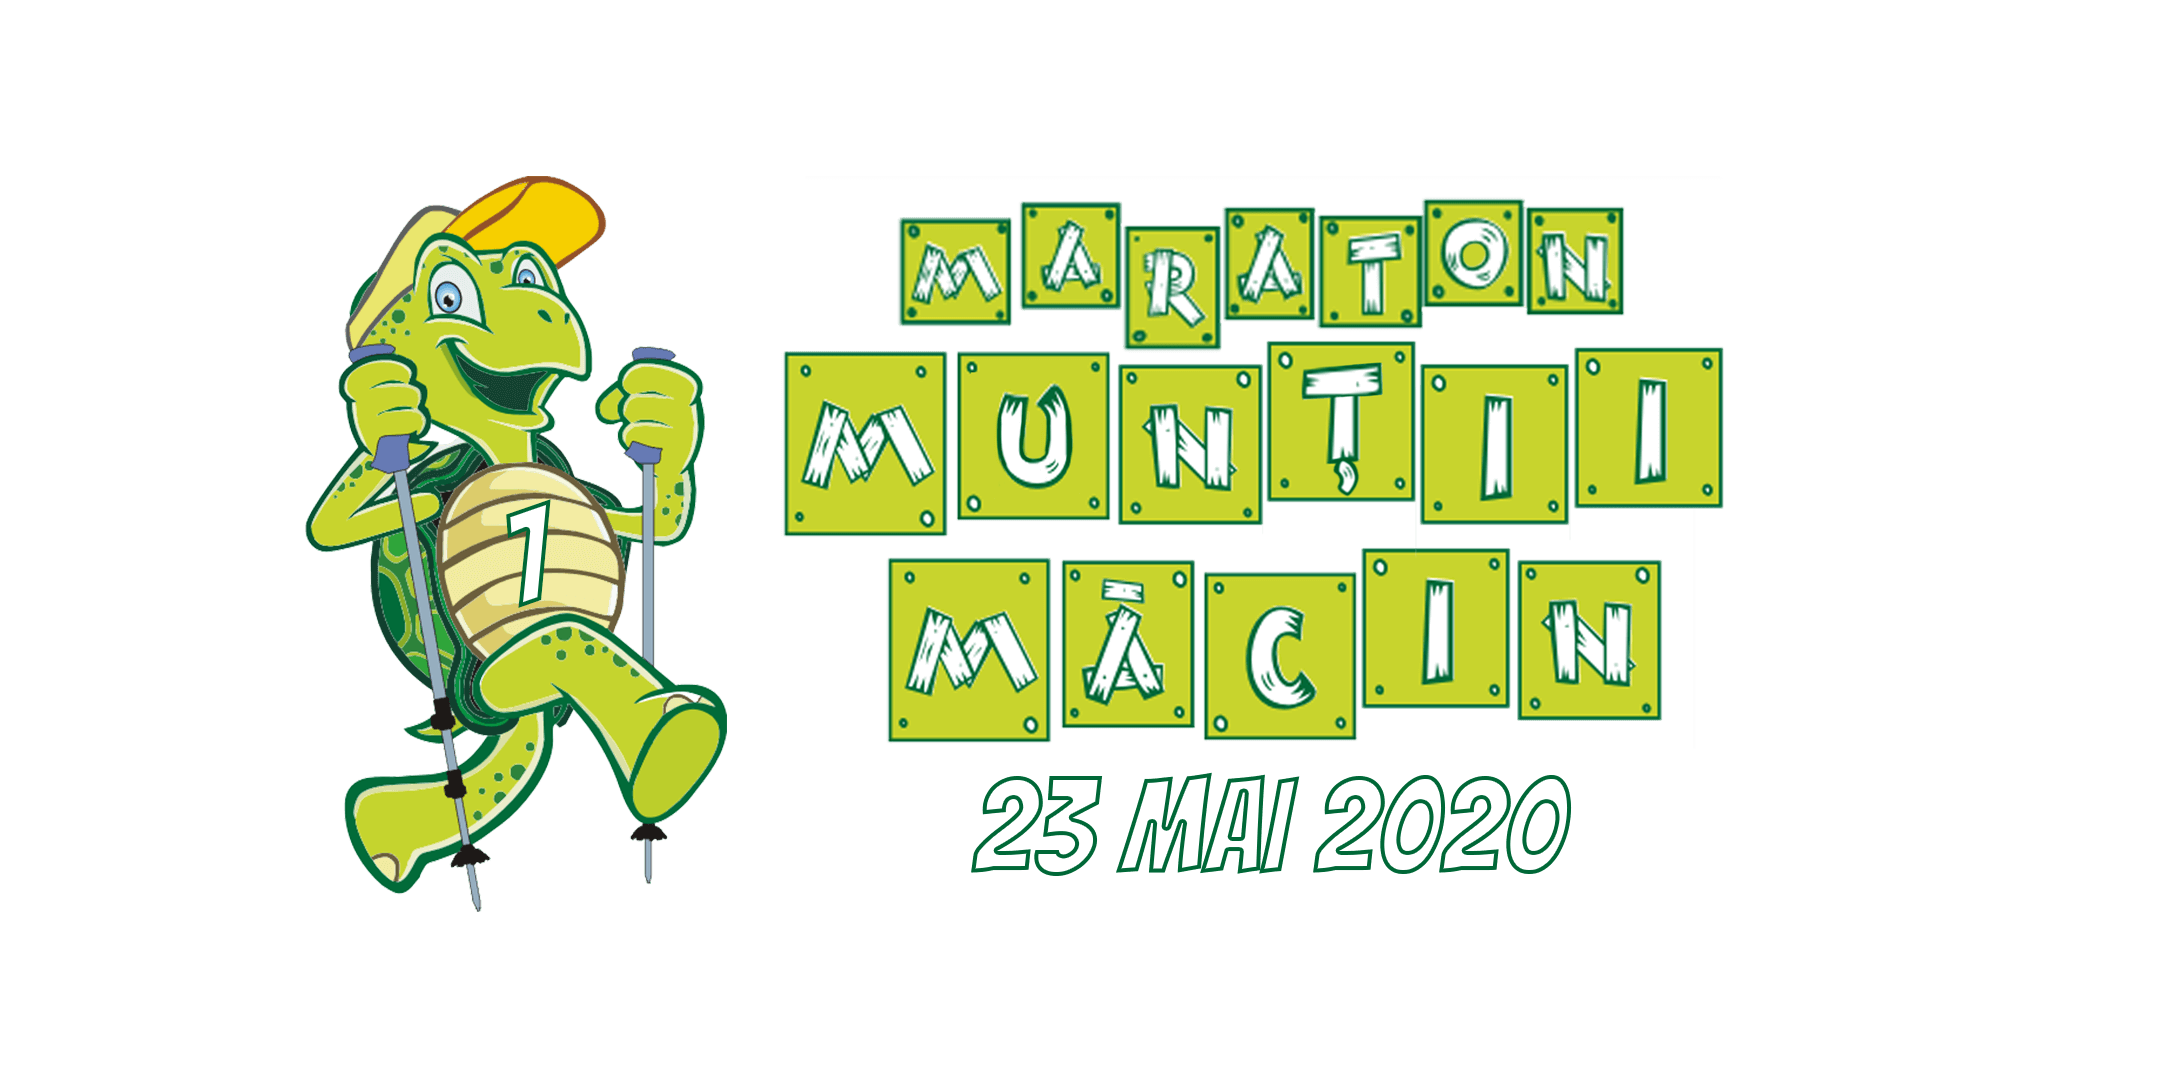 Maraton Muntii Macin 2020